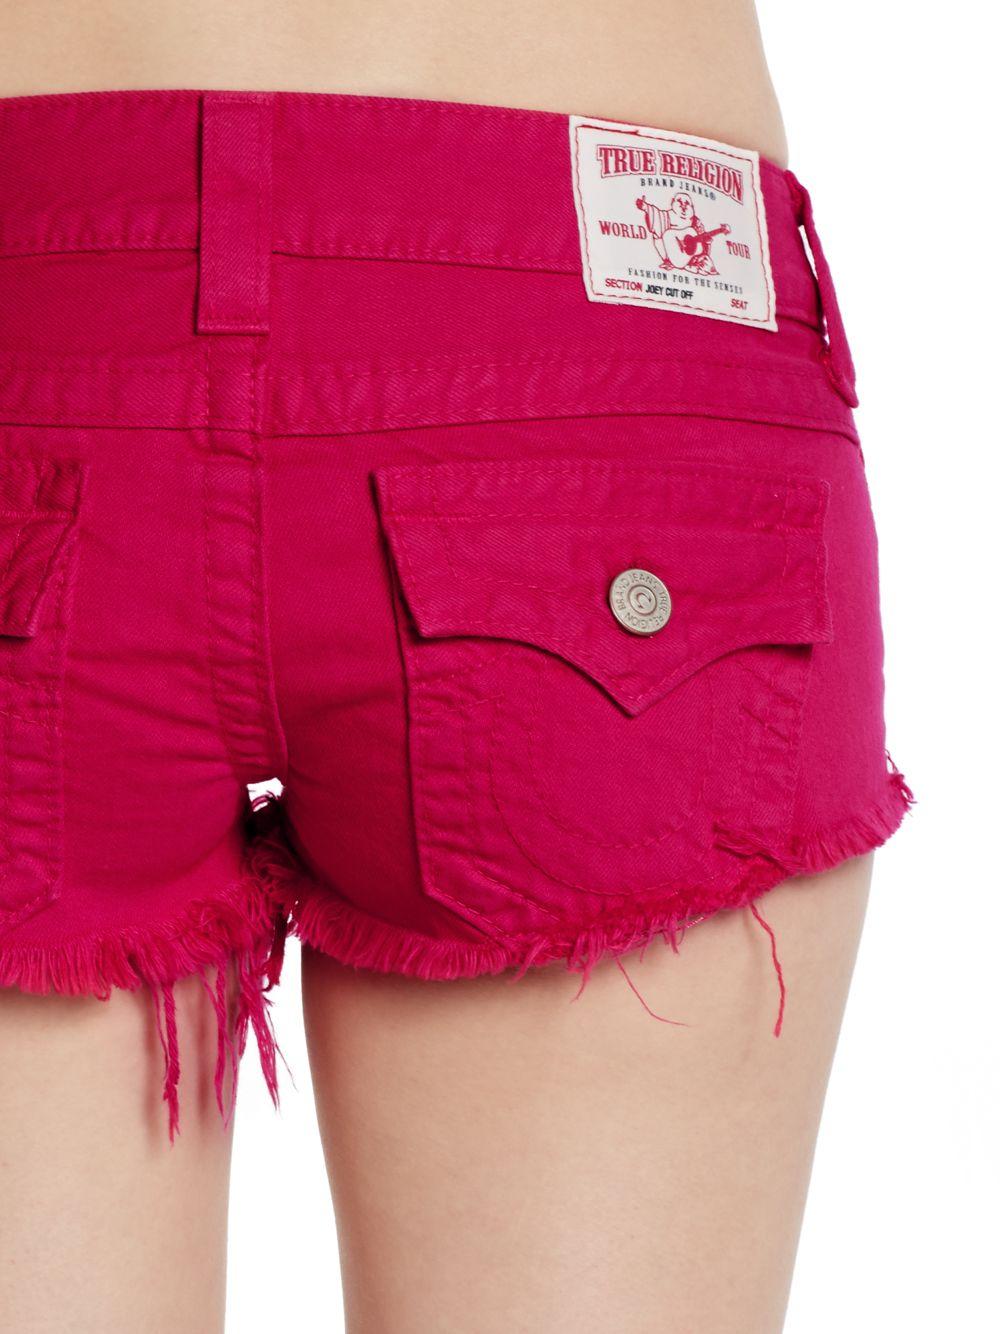 True religion Cut-off Jean Shorts in Pink | Lyst